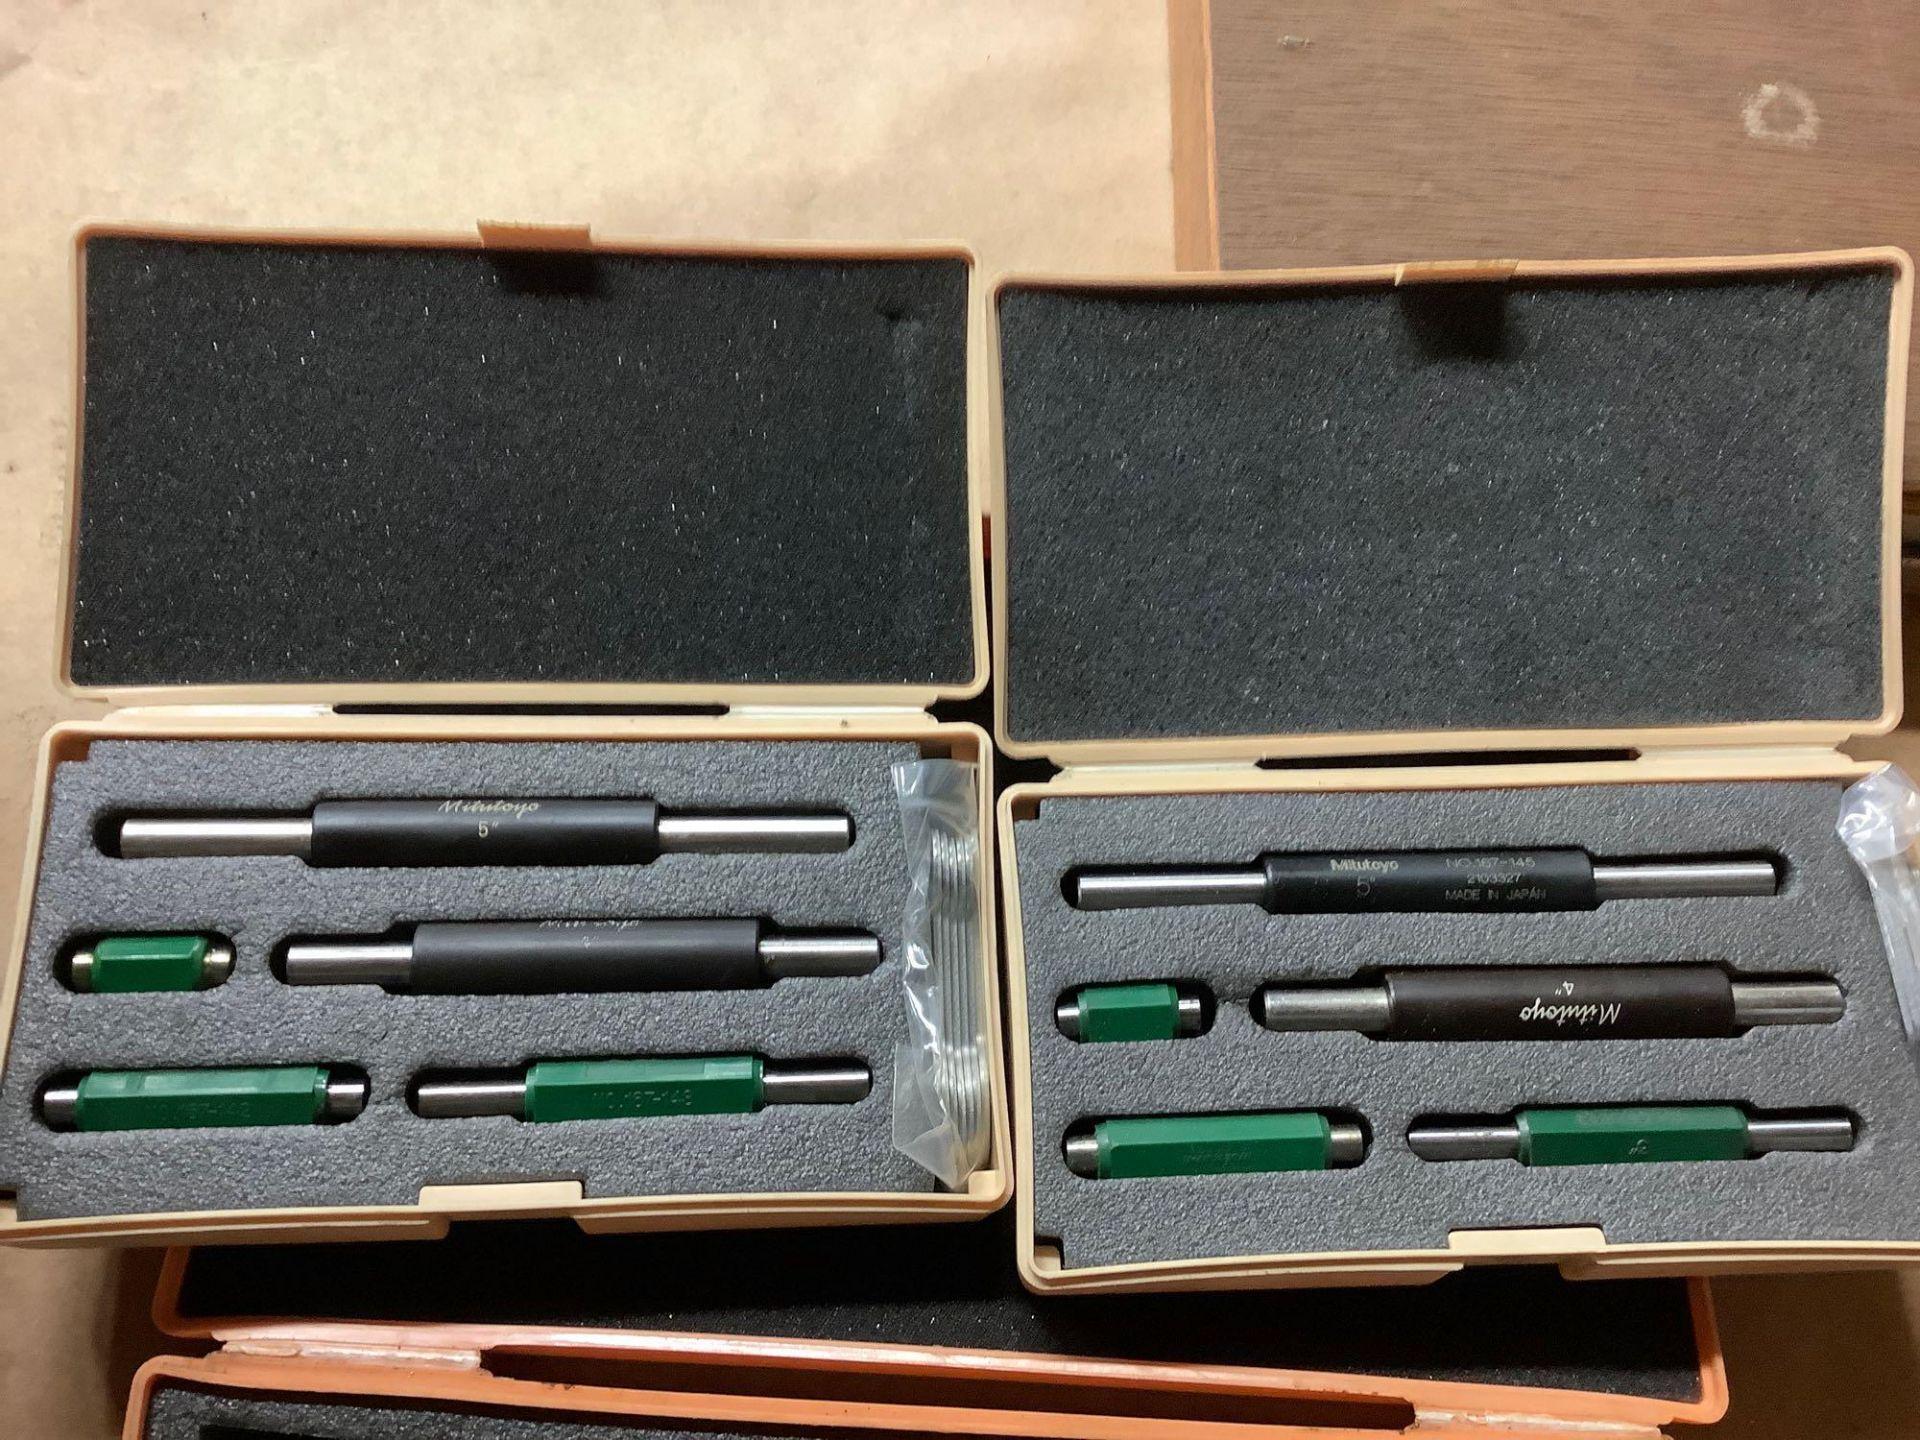 Lot: Mitutoyo Micrometers and Micrometer Bars - Image 5 of 5